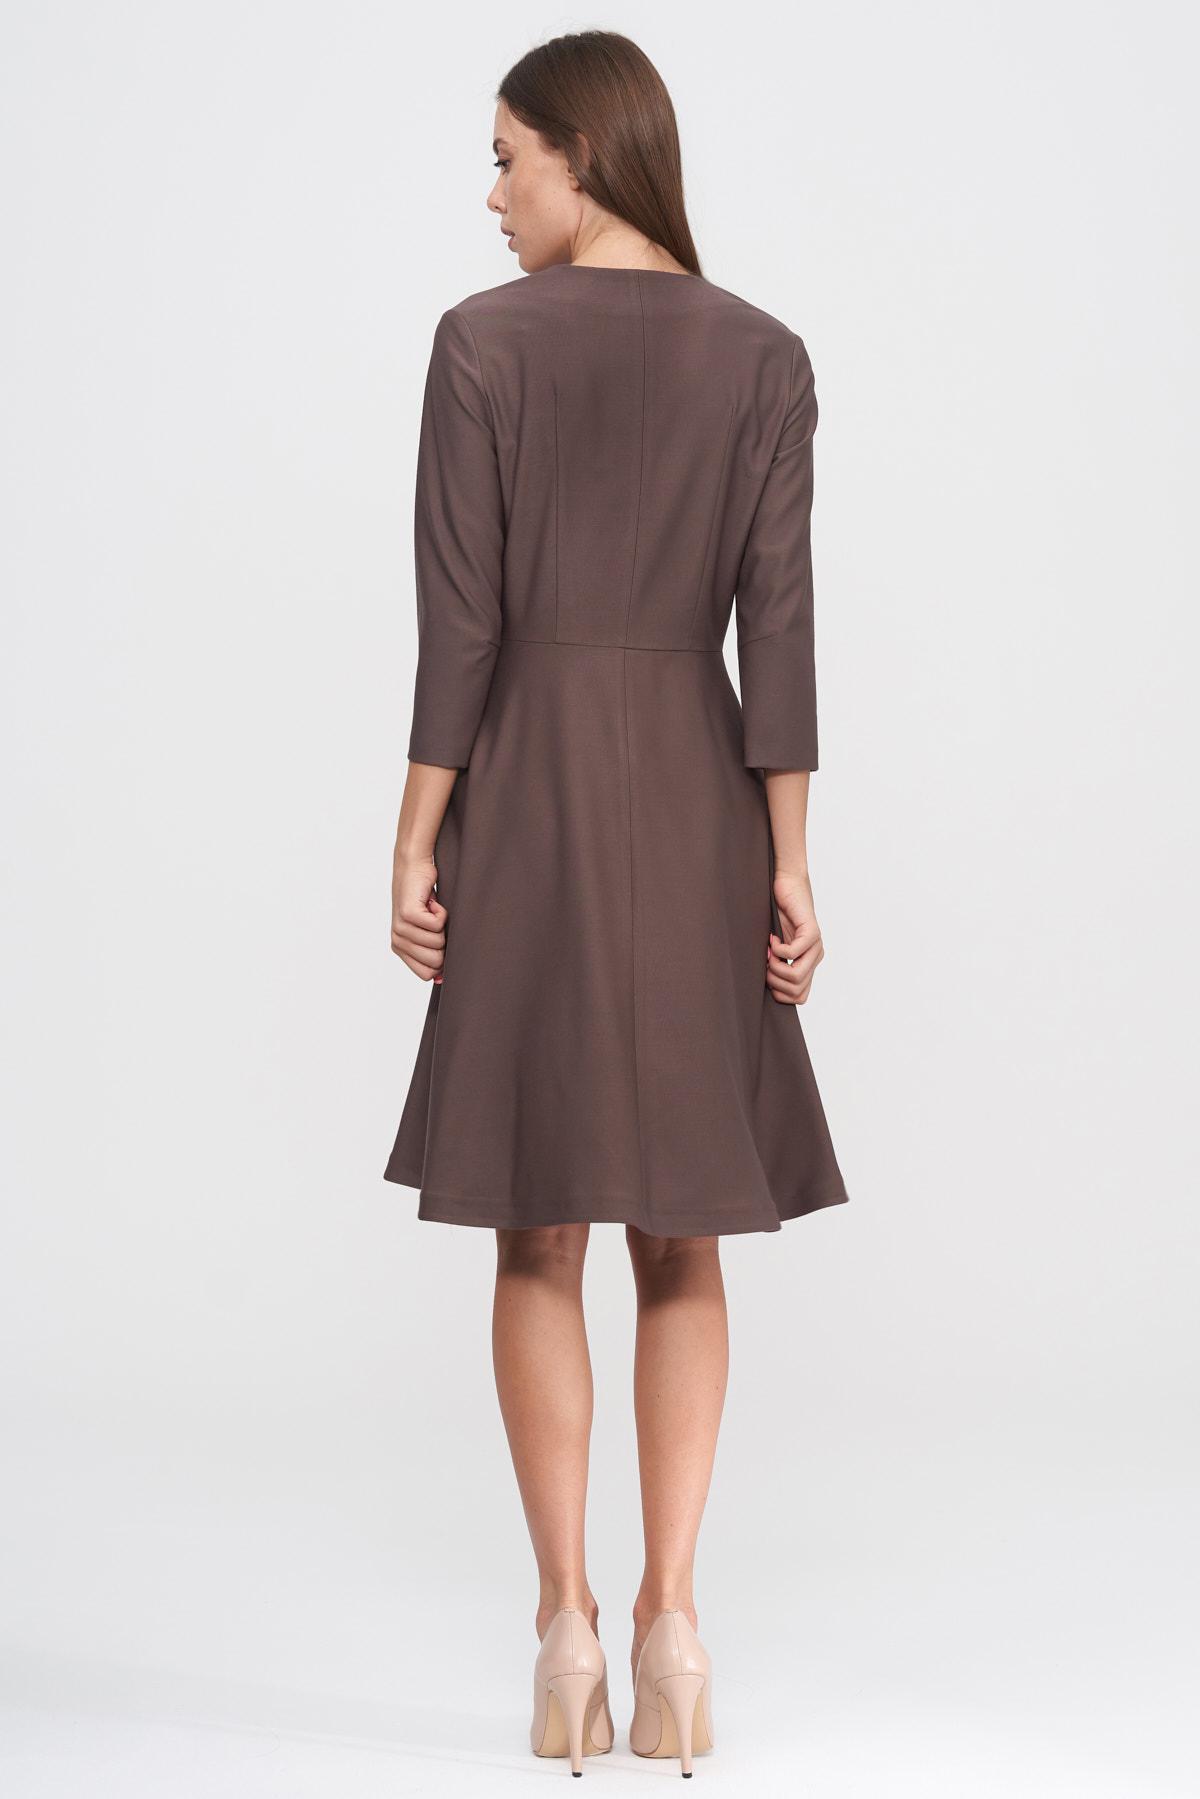 Платье женские Natali Bolgar модель 19117MAD250 характеристики, 2017